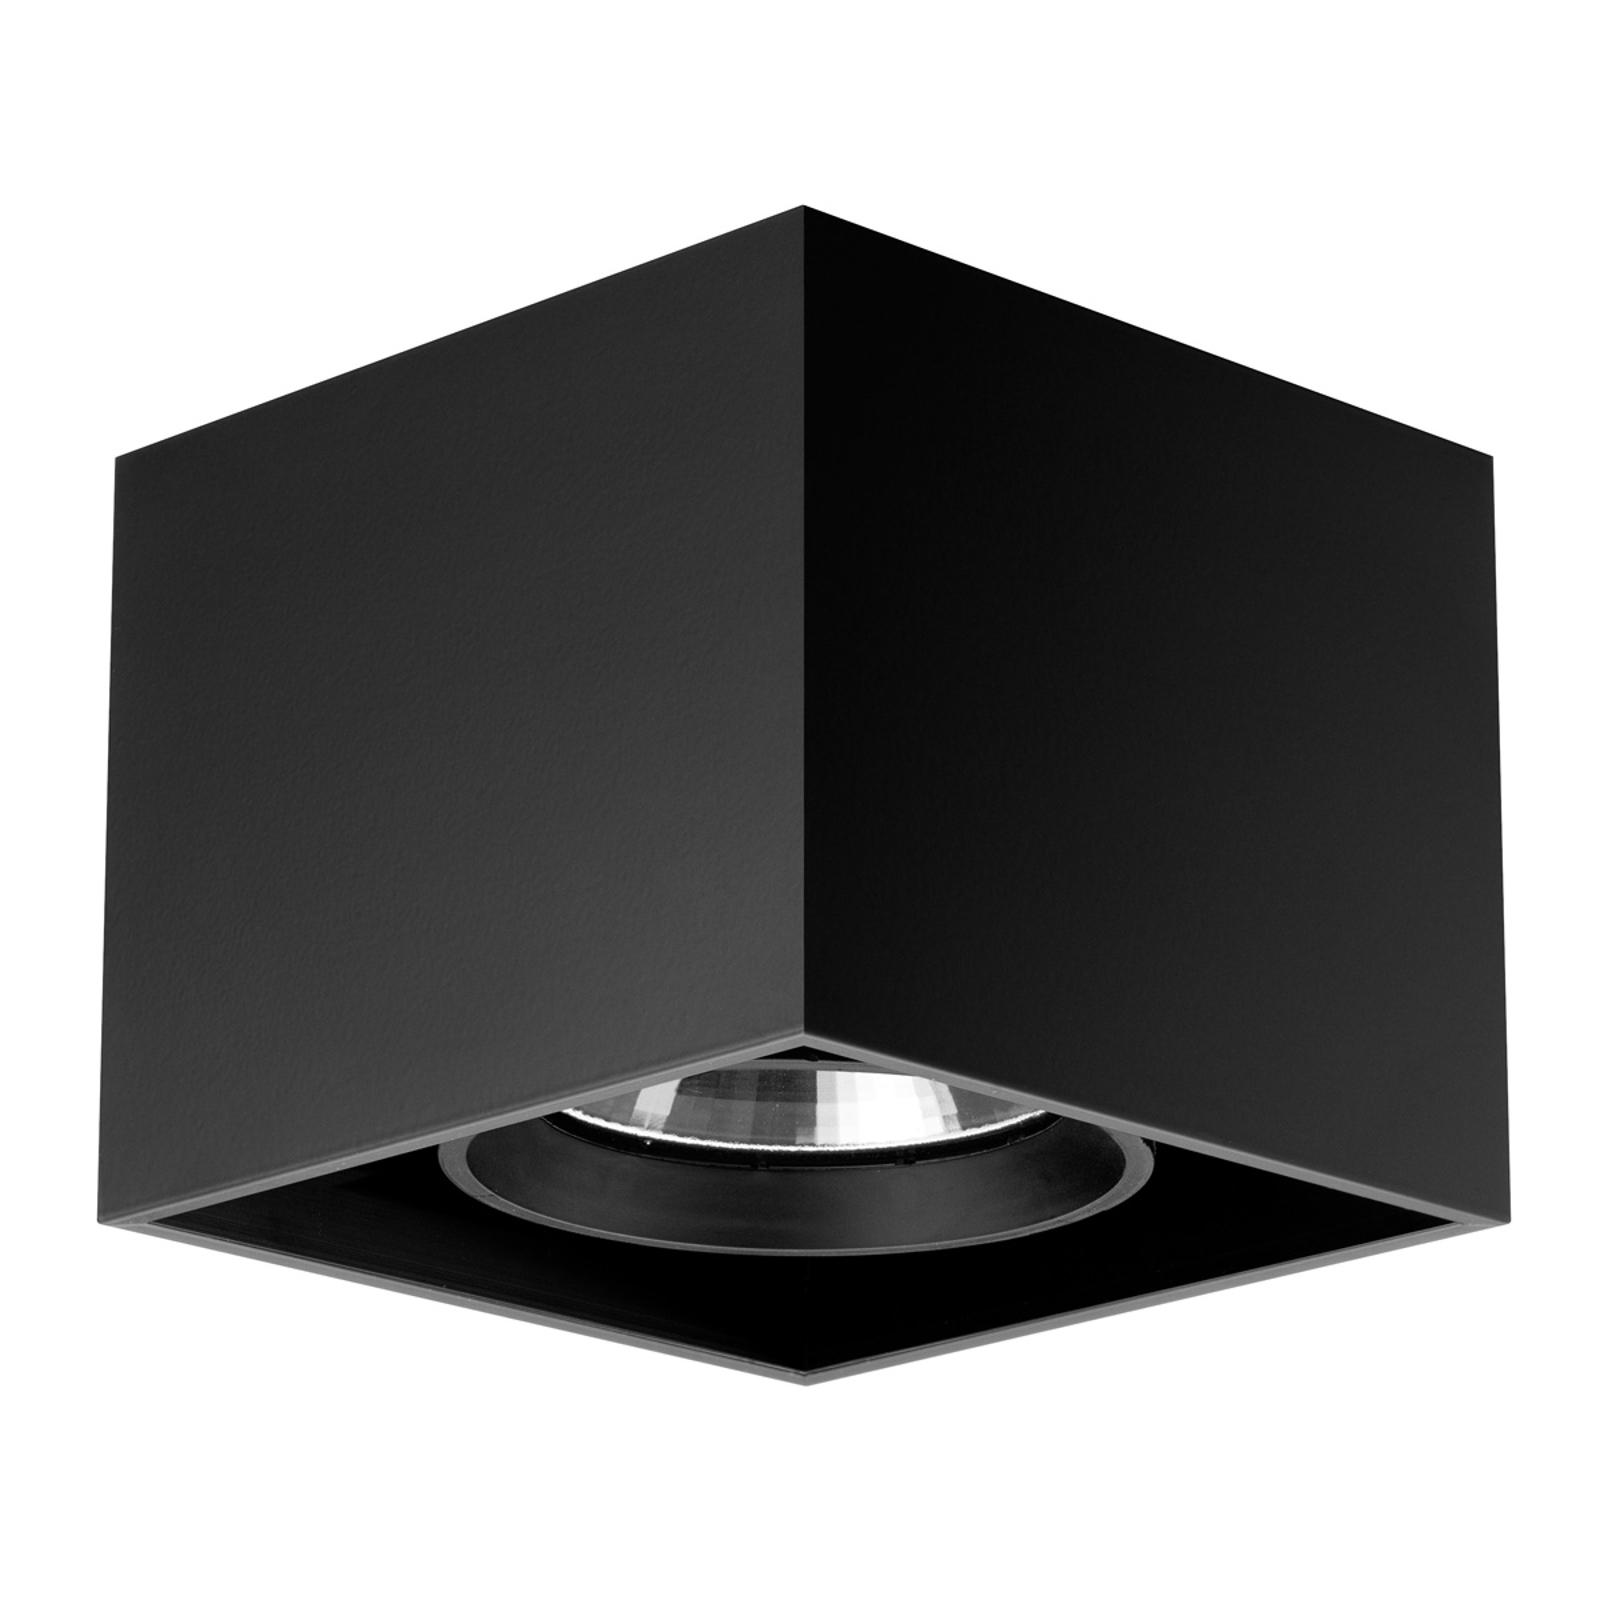 Compass Box - kvadratisk taklampe i svart